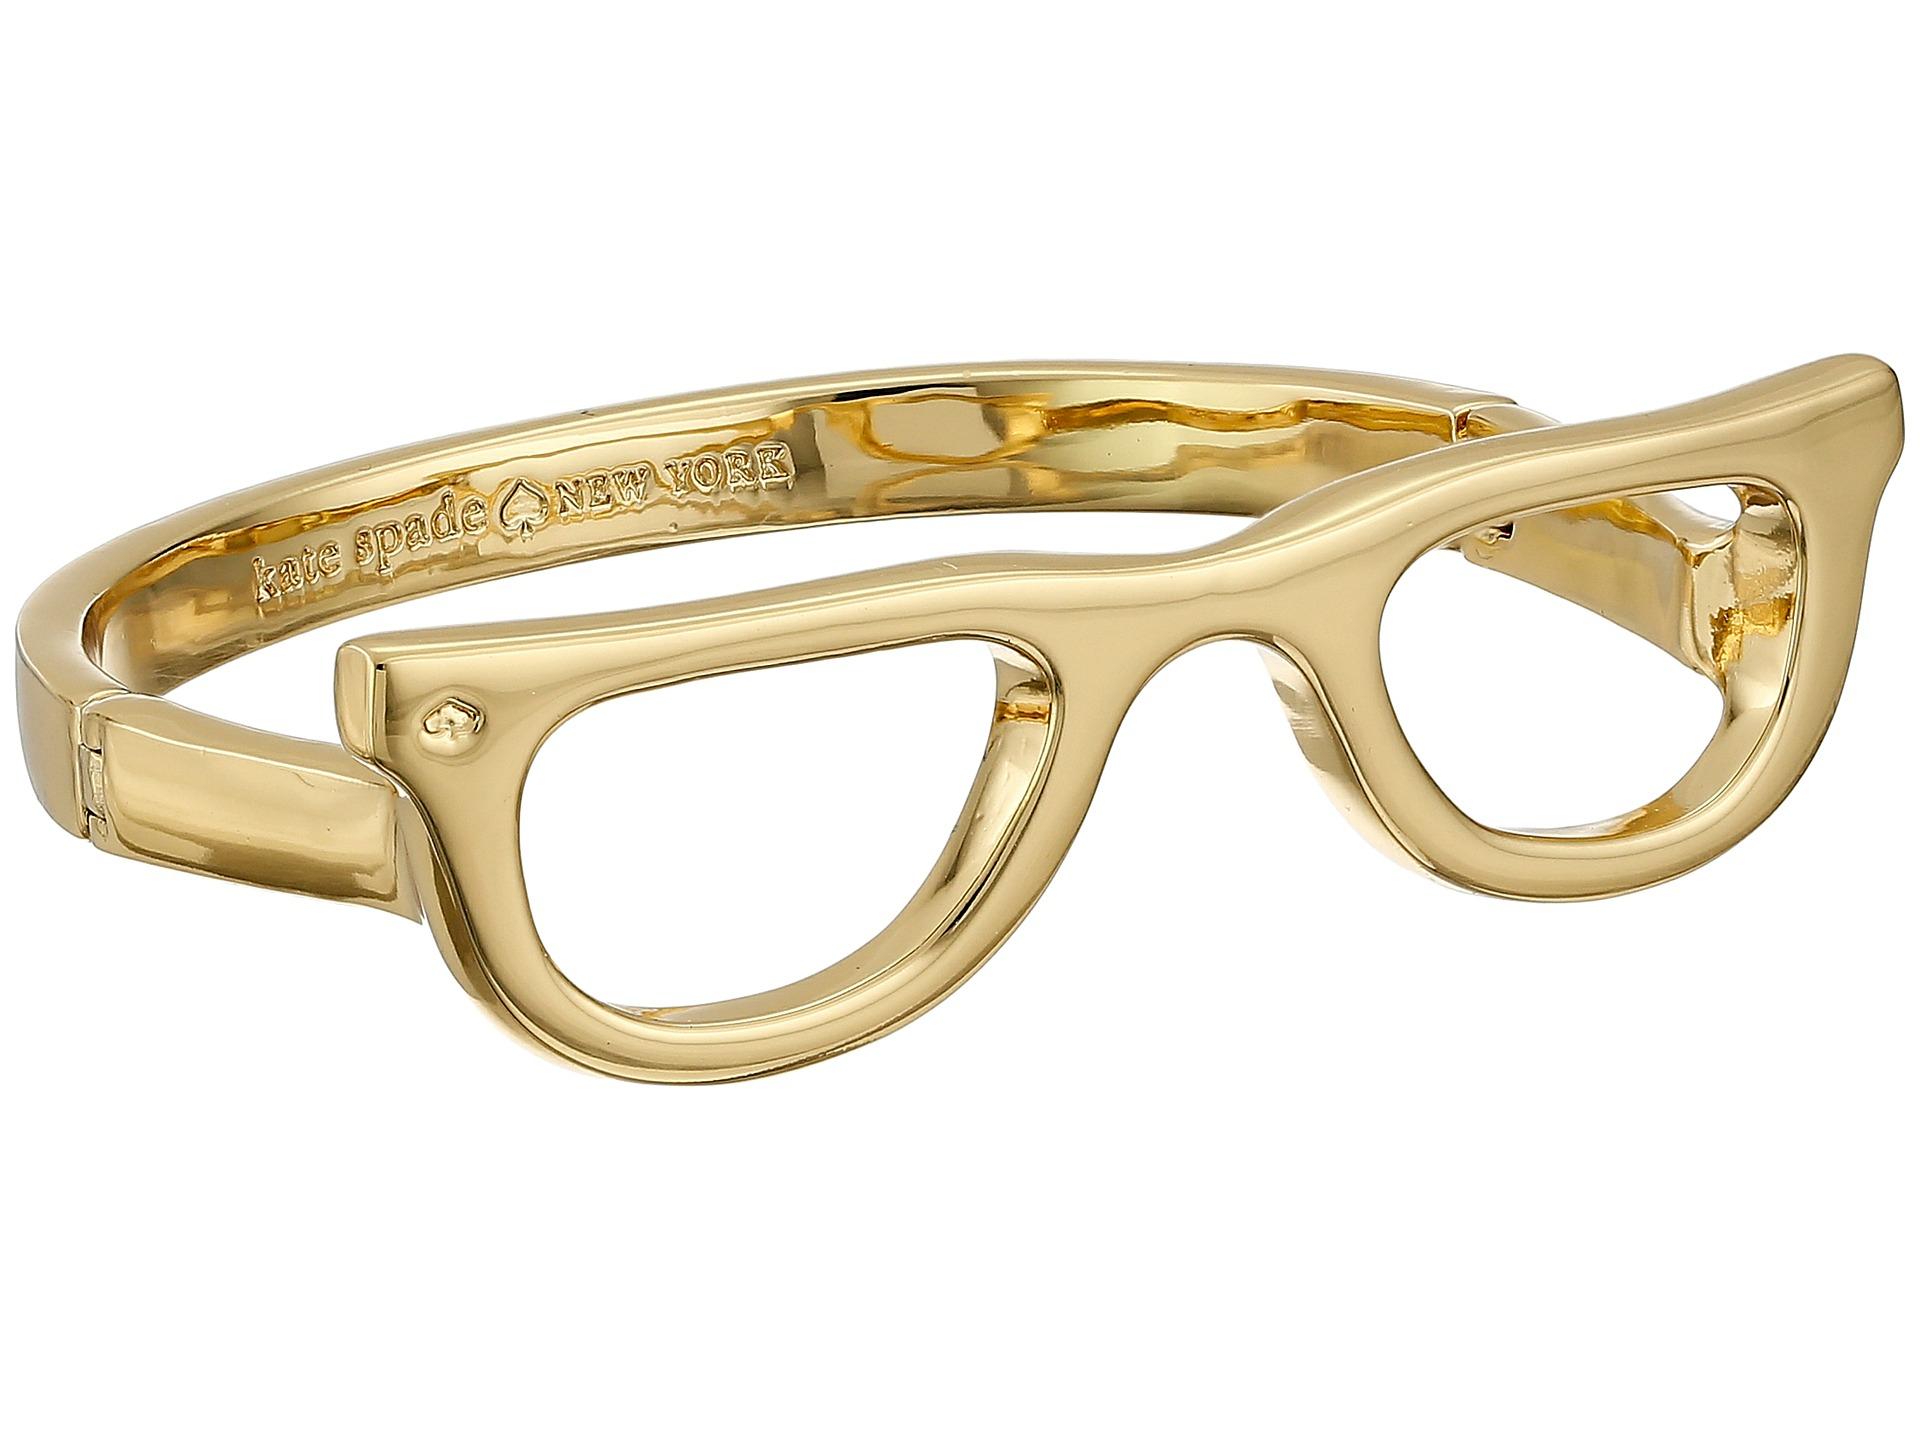 3df7b6d4371 Lyst - Kate Spade Goreski Glasses Bangle Bracelet in Metallic